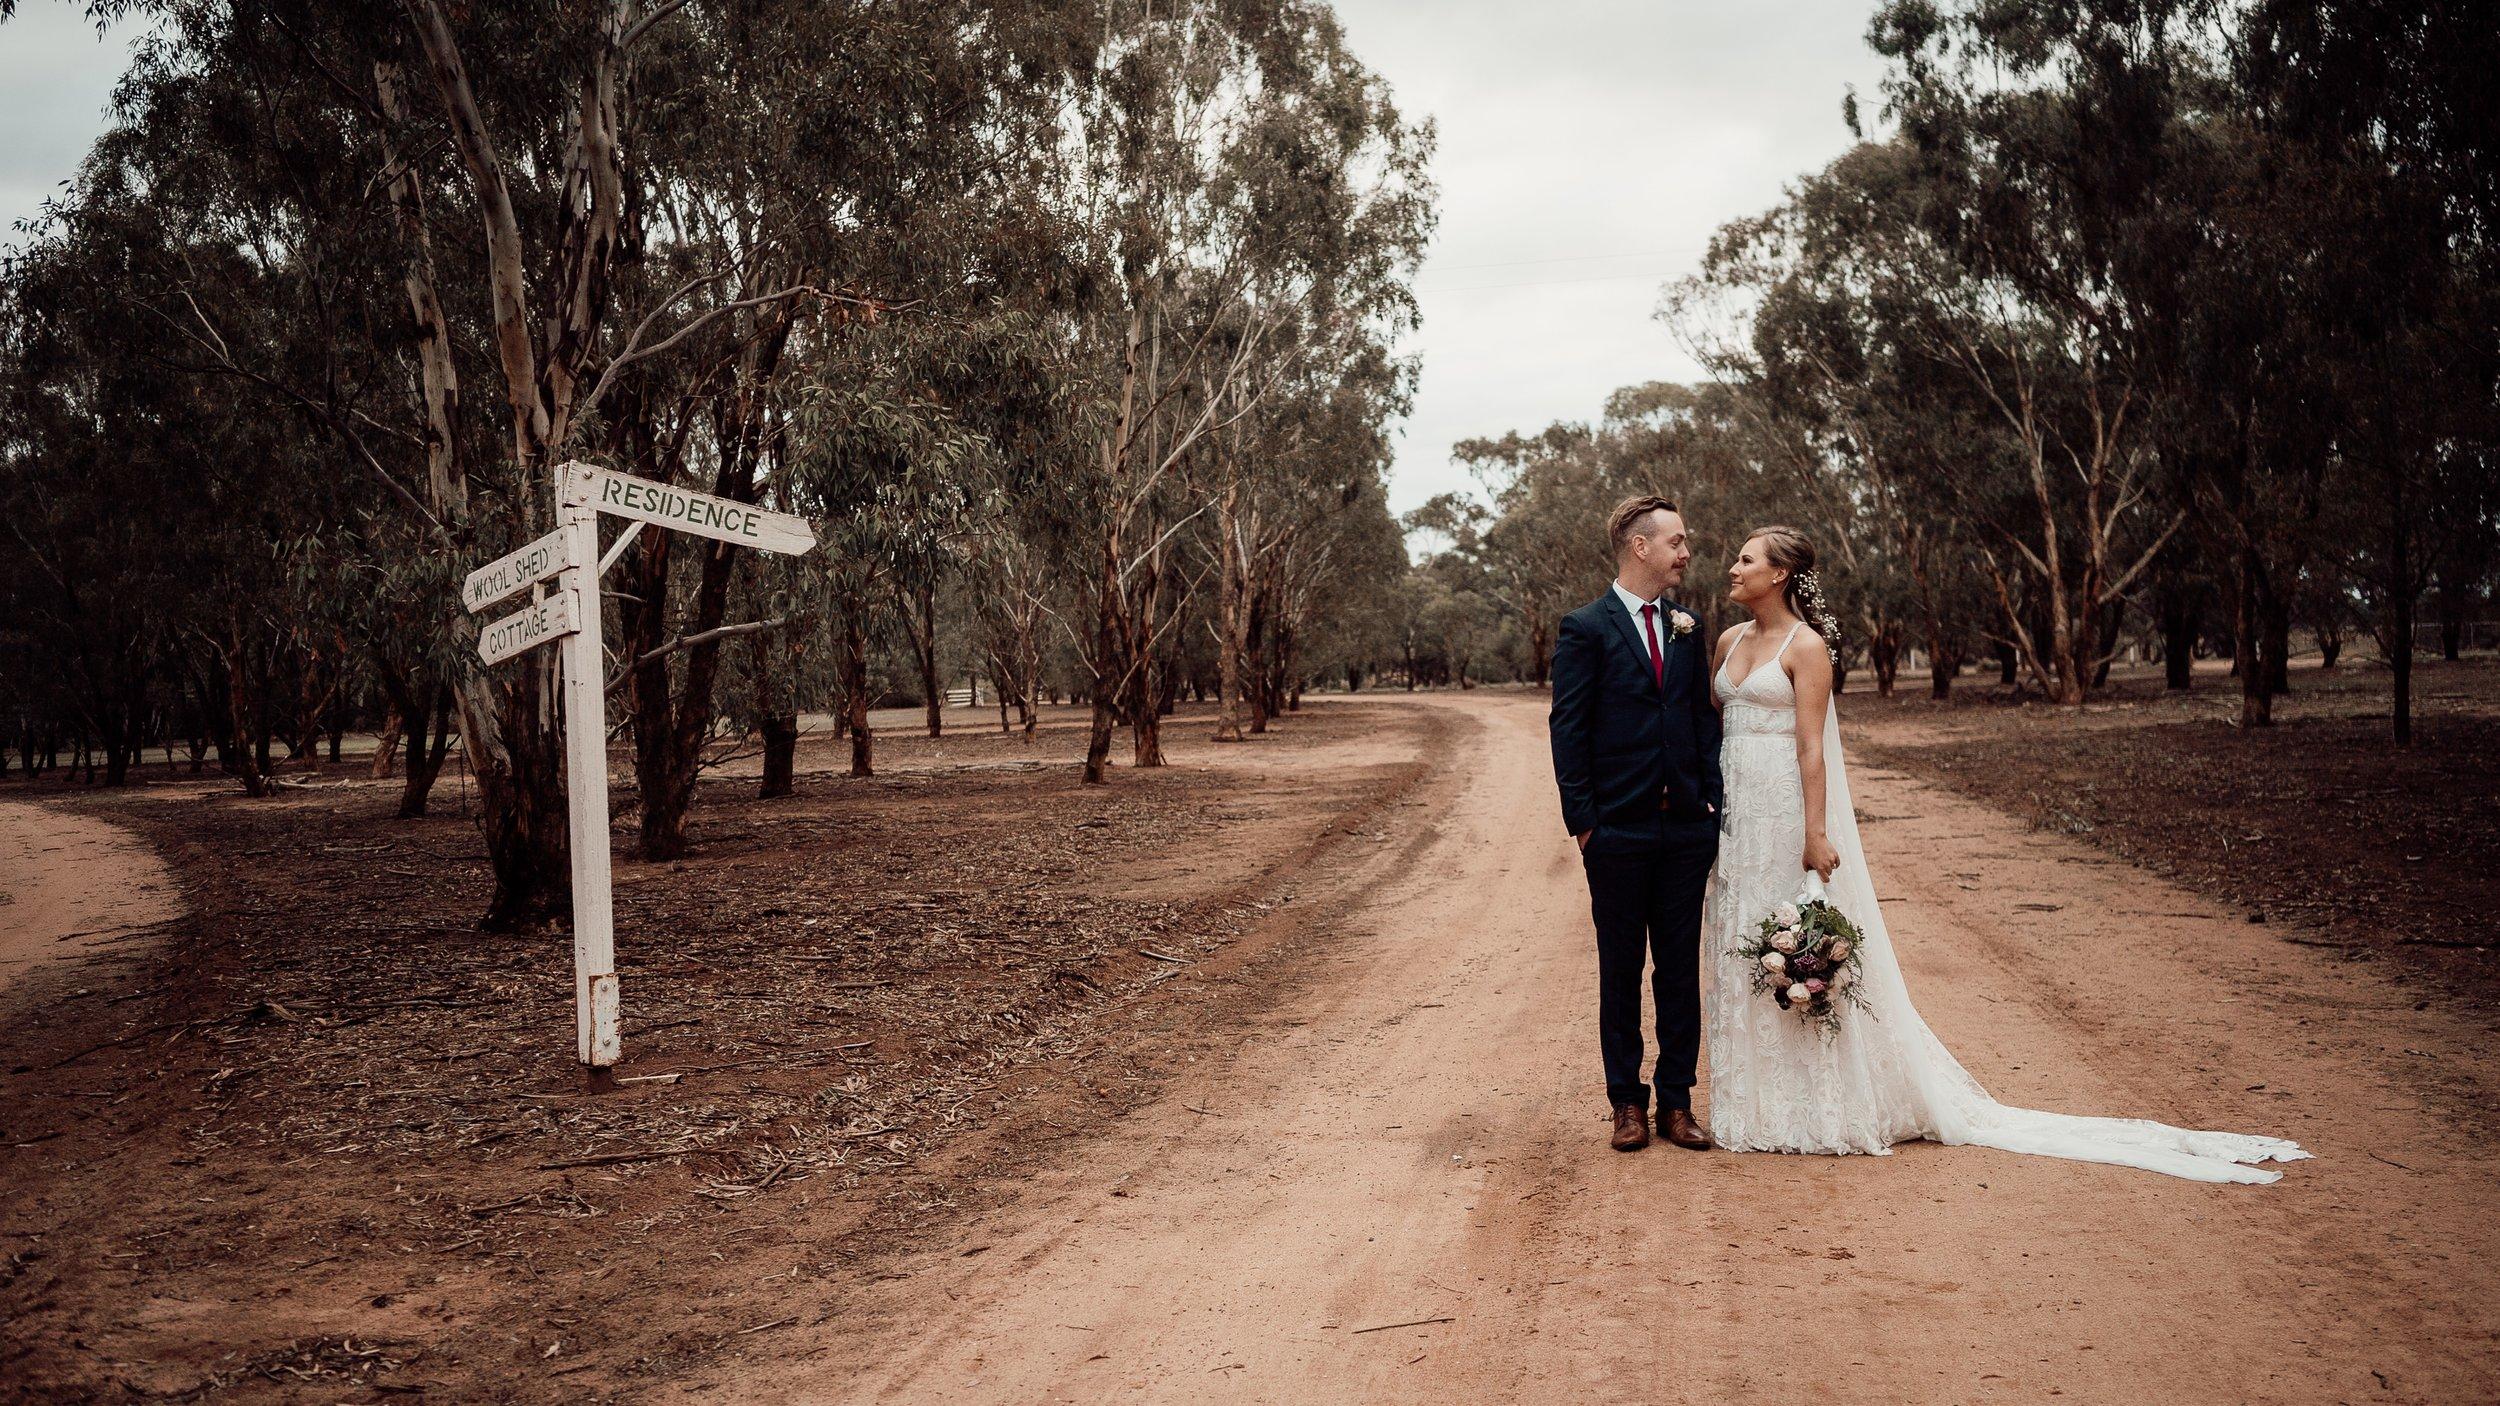 mickalathomas_puremacphotography_weddingphotographer_couplephotographer_Sheppartonphotographer_1463.jpg